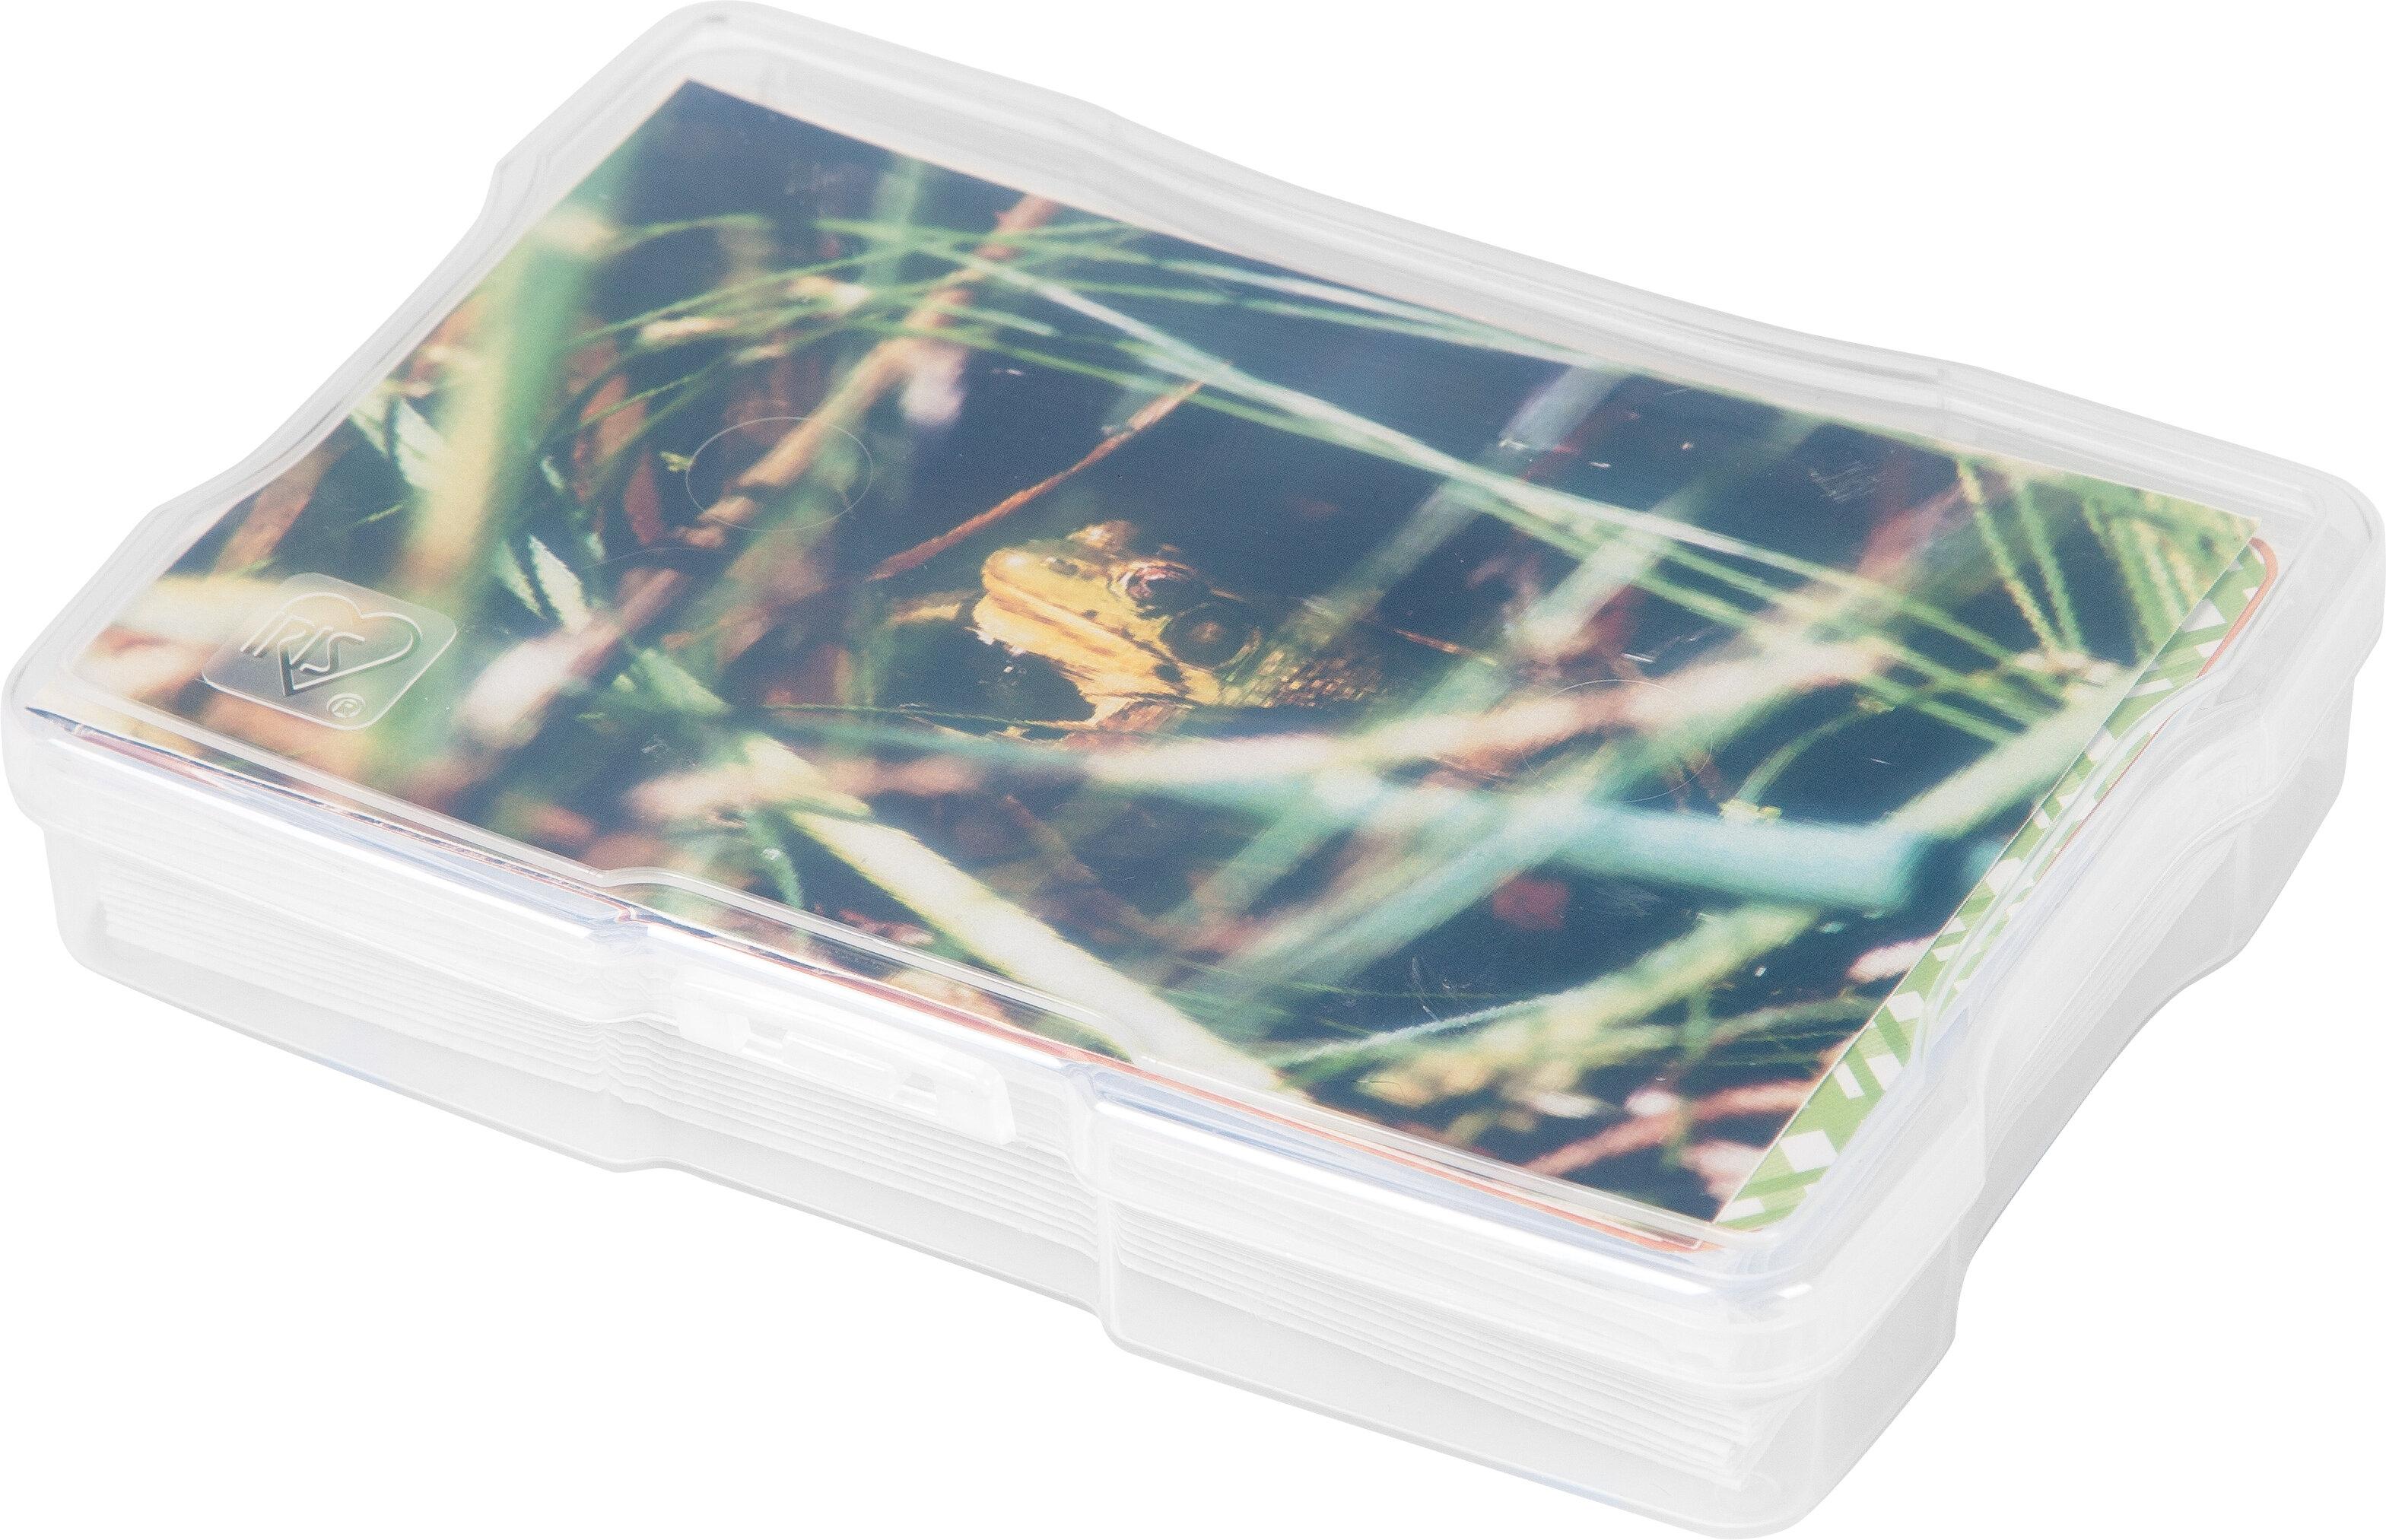 sc 1 st  Wayfair & IRIS 4x6 Photo Storage and Craft Case u0026 Reviews | Wayfair